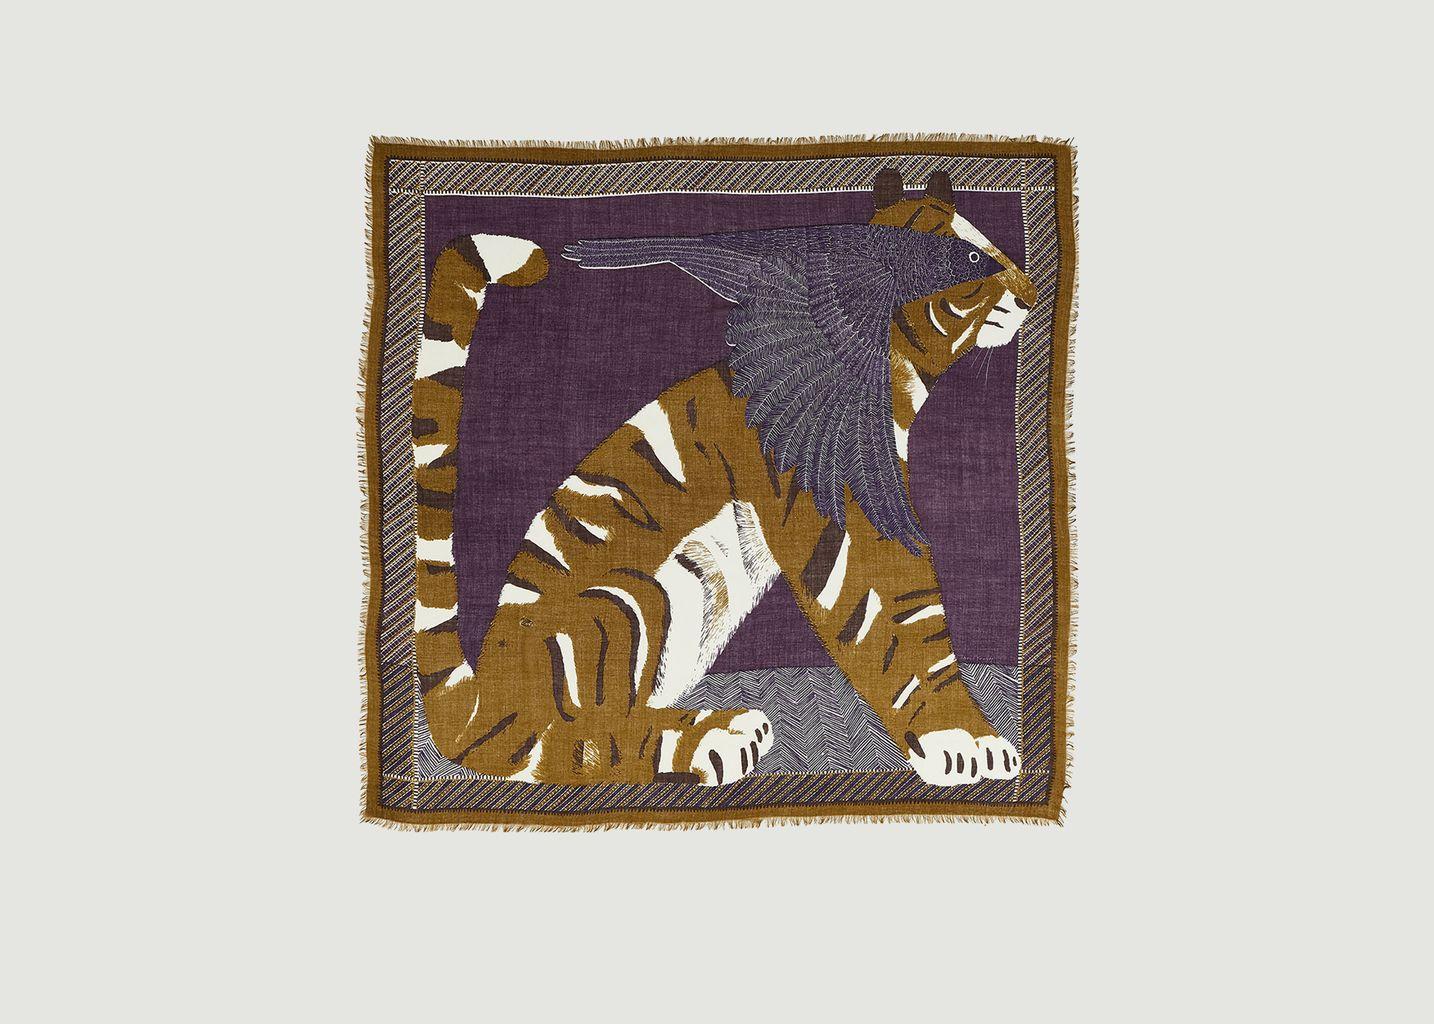 Etole carrée en laine motif tigre Jean-Loup - Inouitoosh